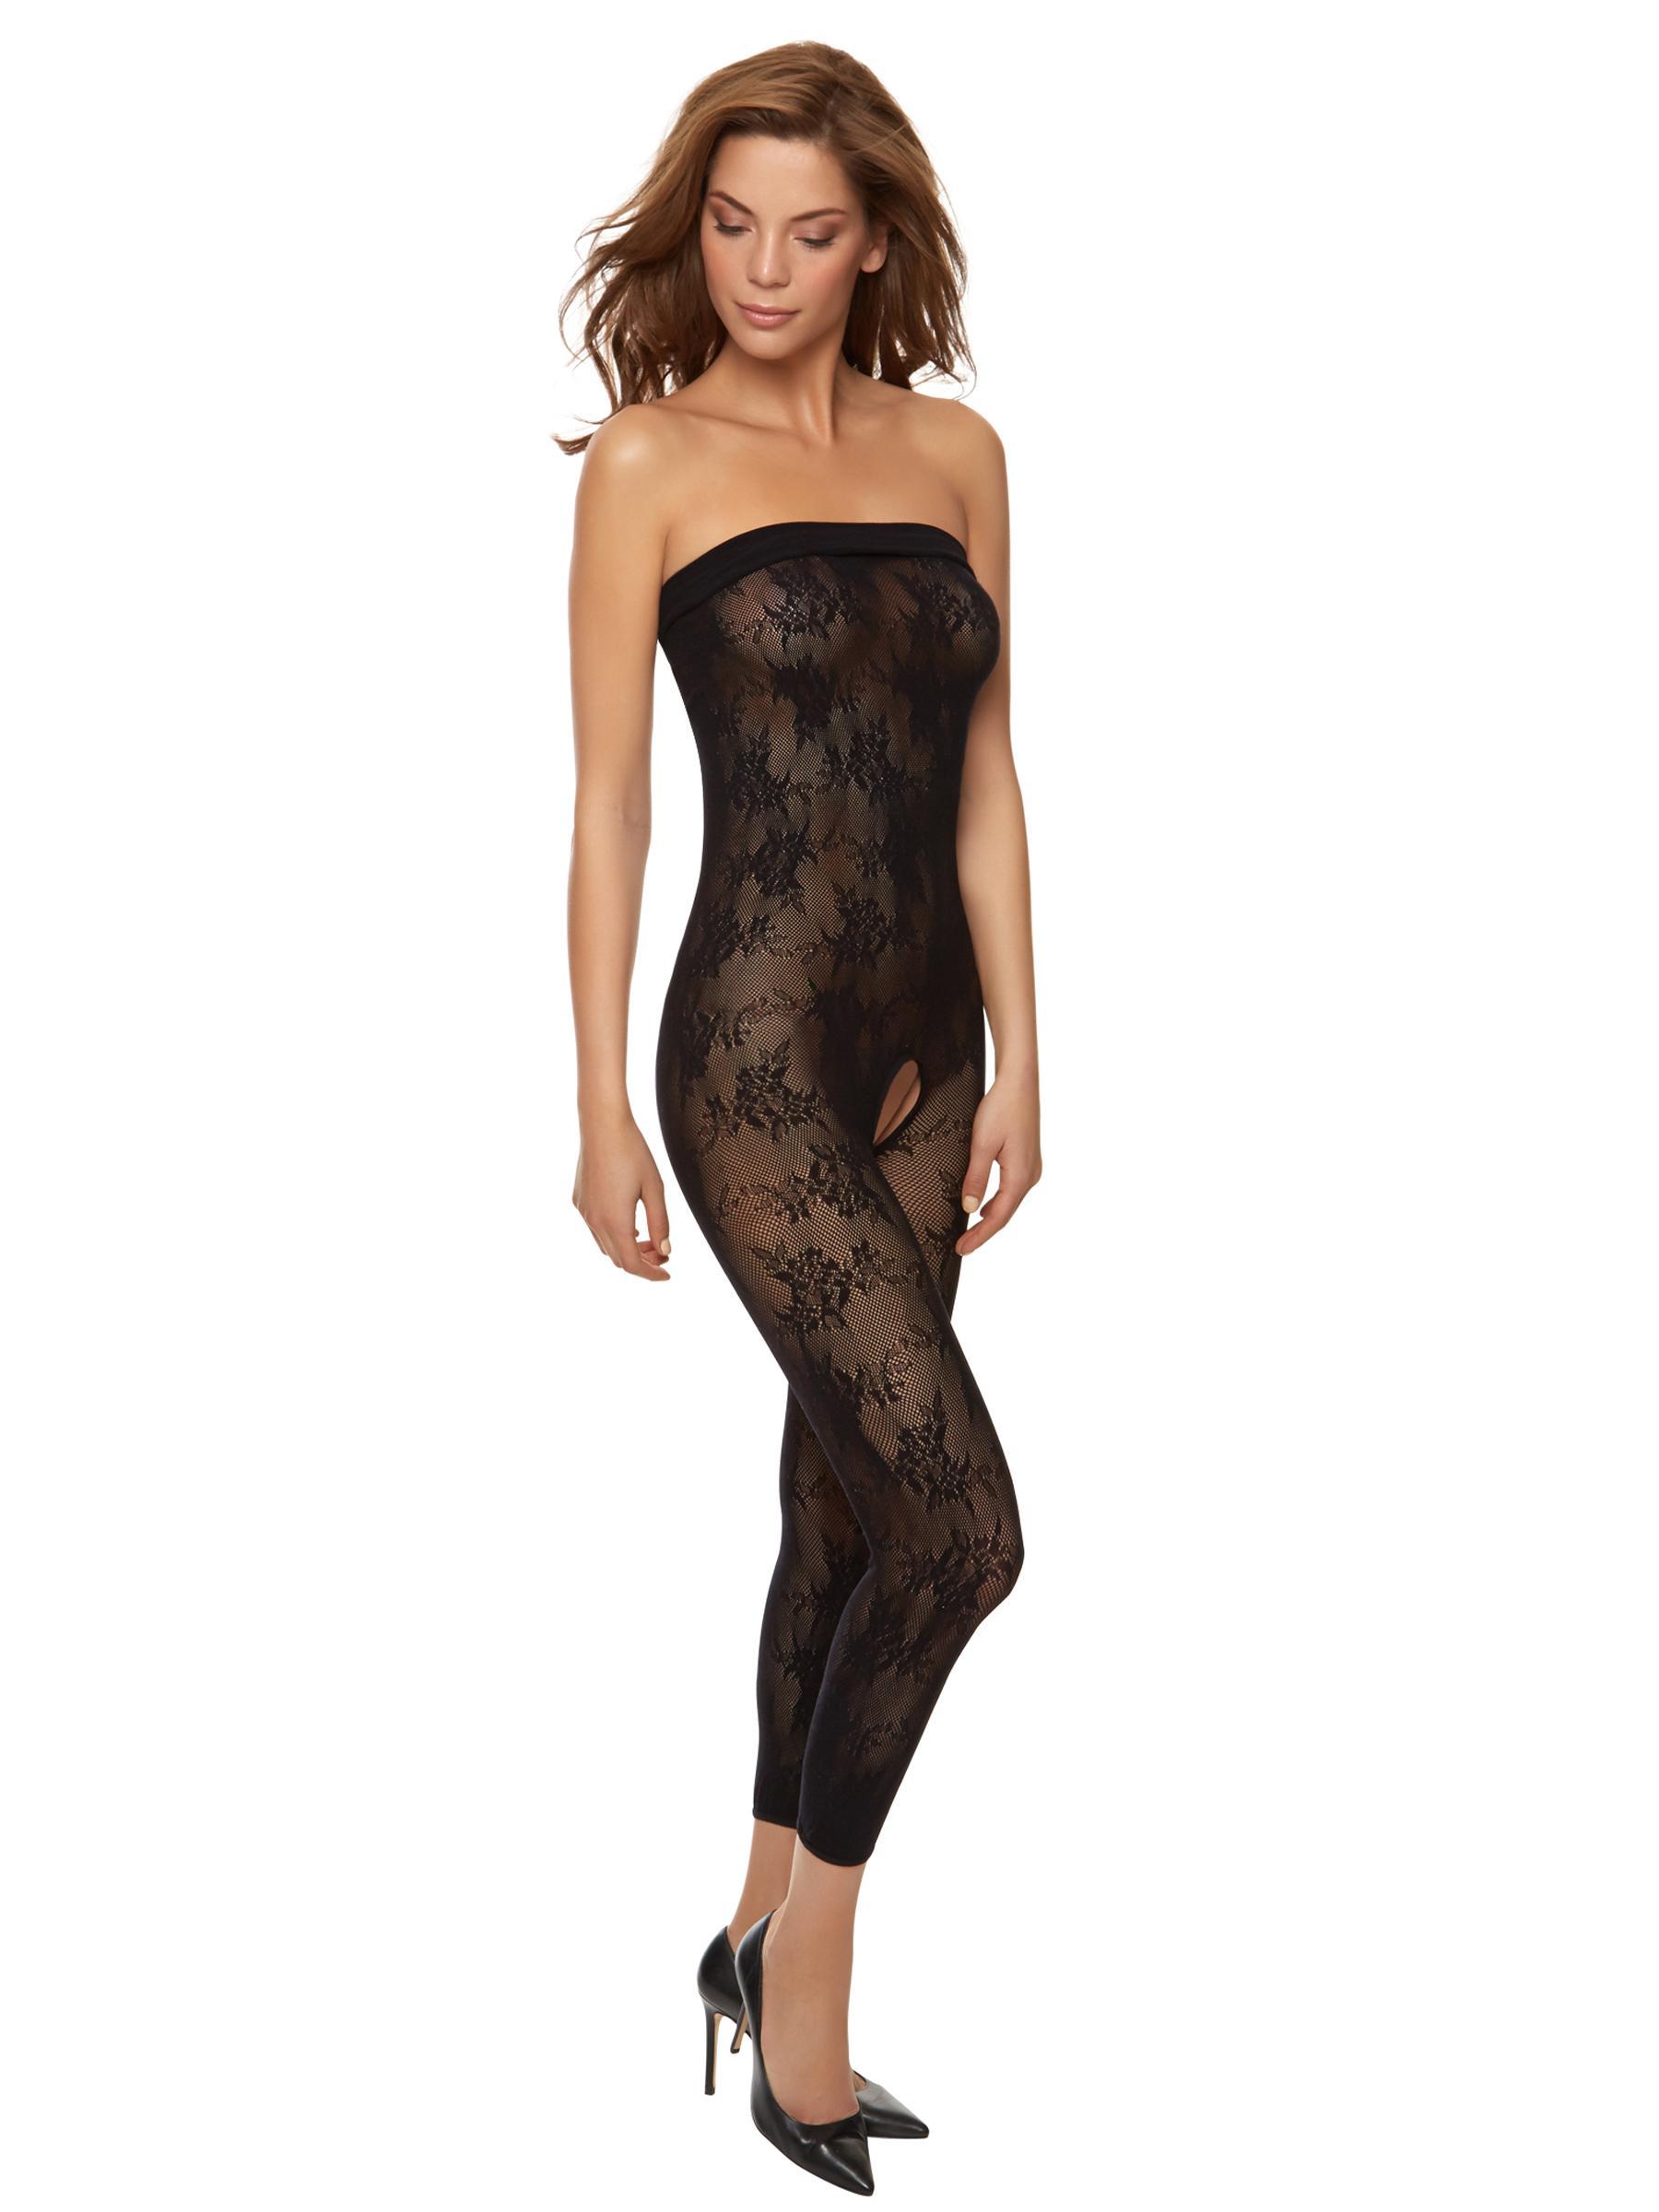 07207bdc5ab Ann Summers Womens Tyra Reversible Bodystocking Black Sexy Lingerie  Underwear